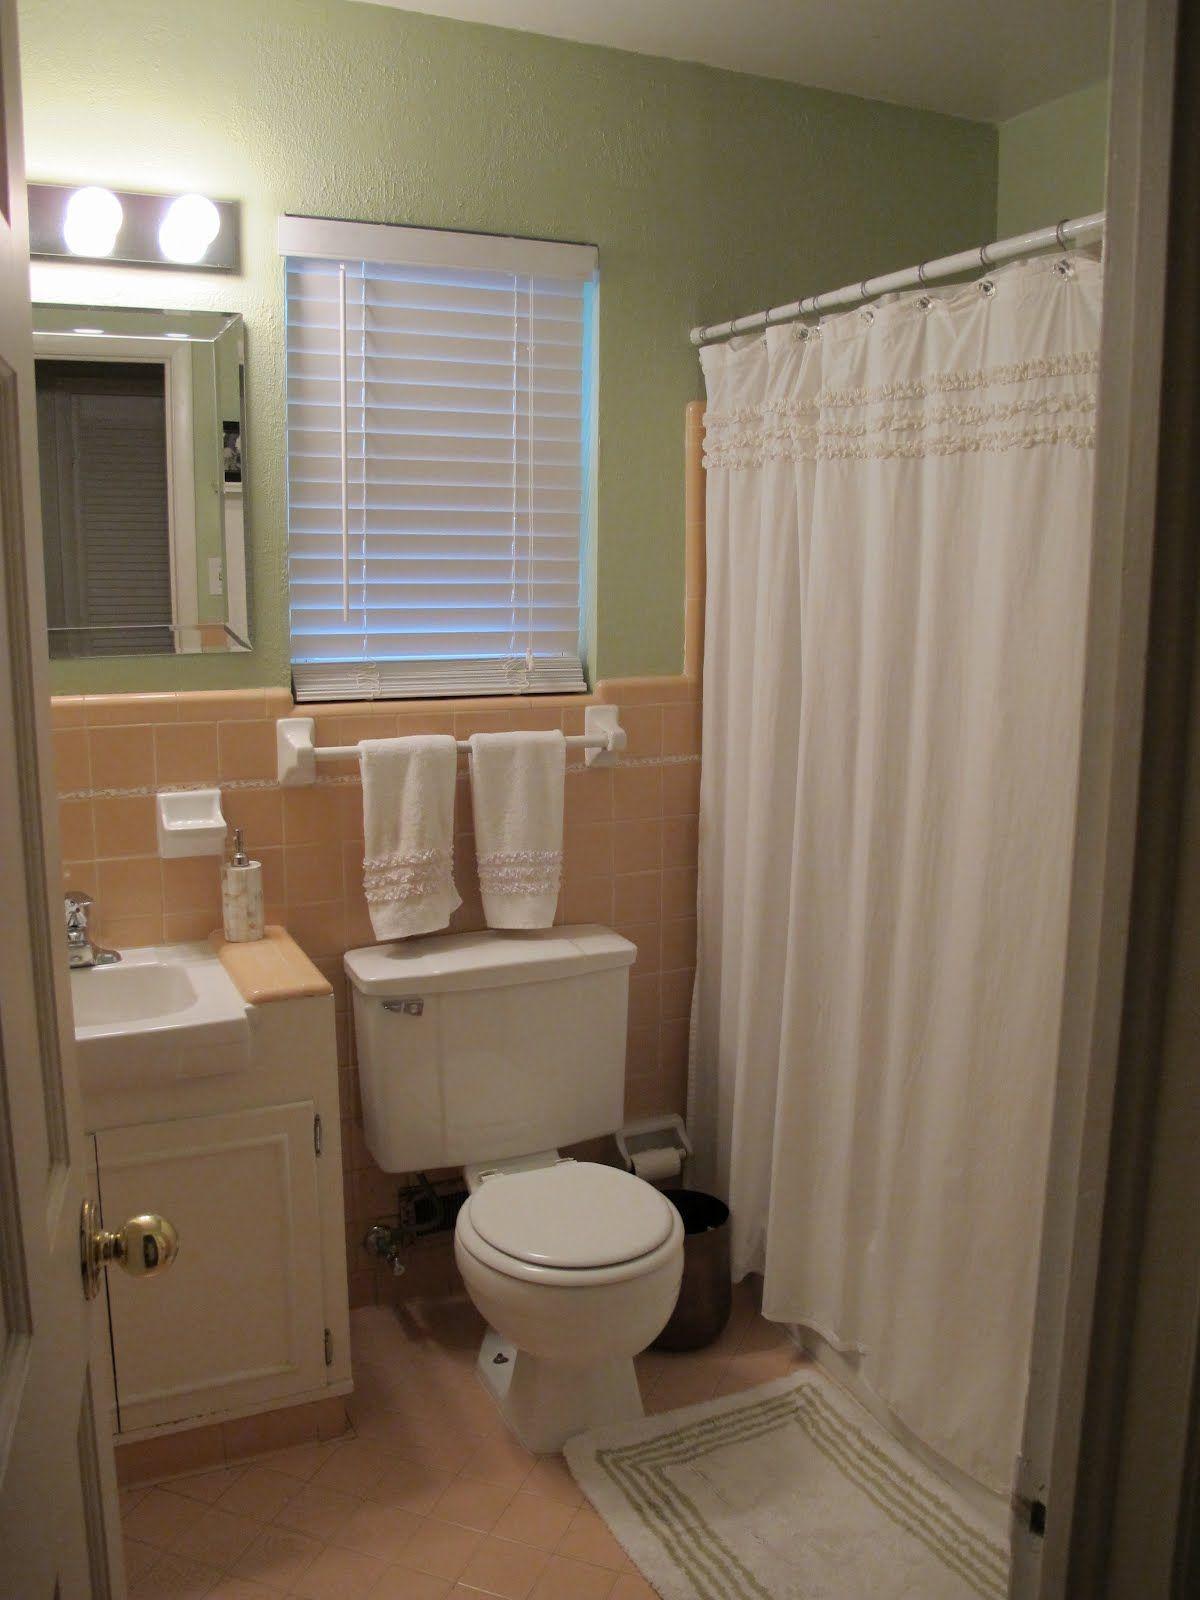 Help Peach Brown Bathroom Tile Home, What Colours Go With Peach Bathroom Tiles